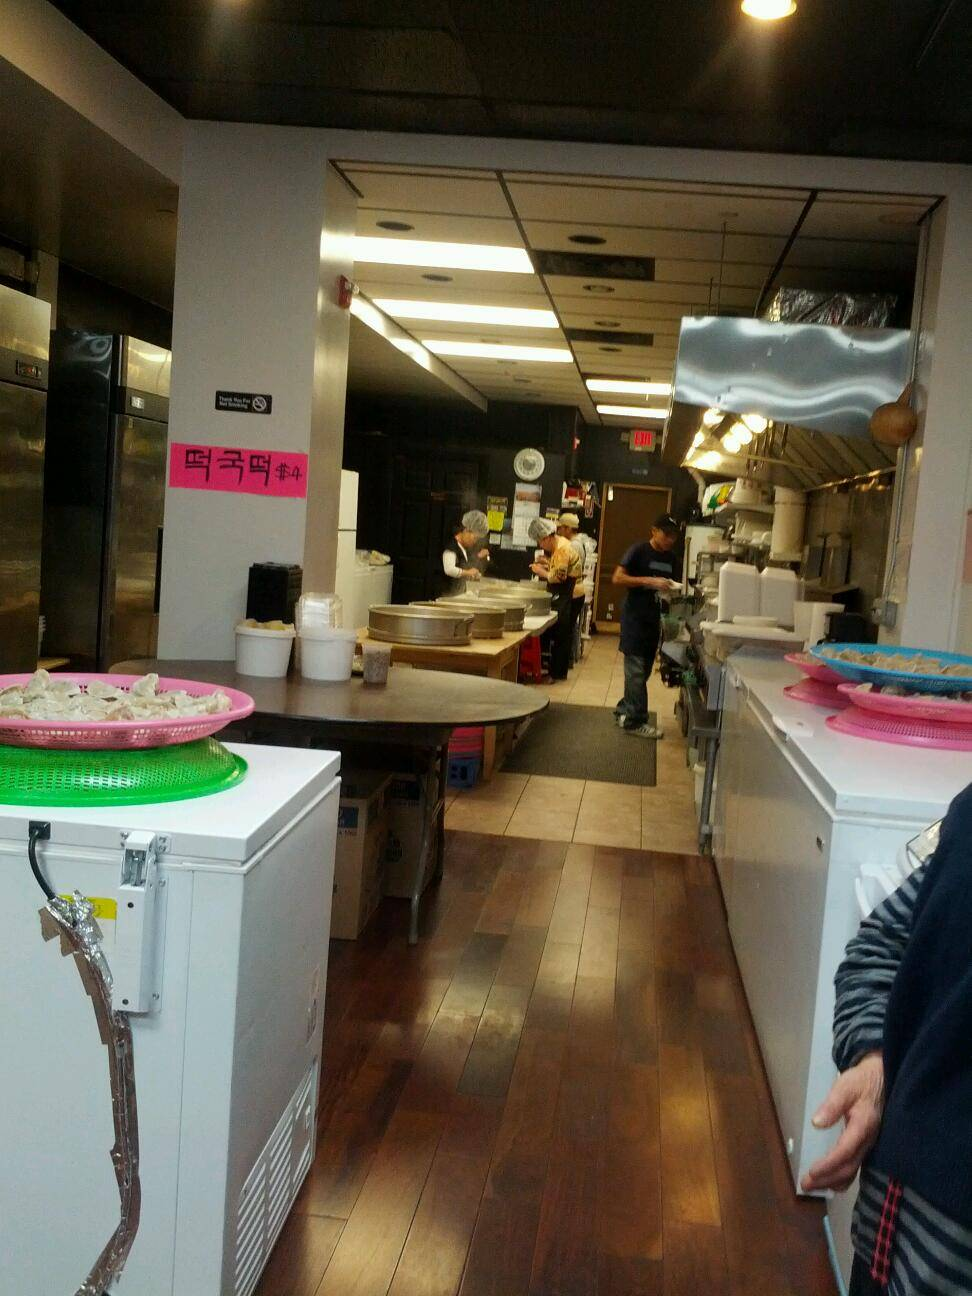 Mama Best Food 엄마손 만두   restaurant   1420 Bergen Blvd, Fort Lee, NJ 07024, USA   2019441392 OR +1 201-944-1392